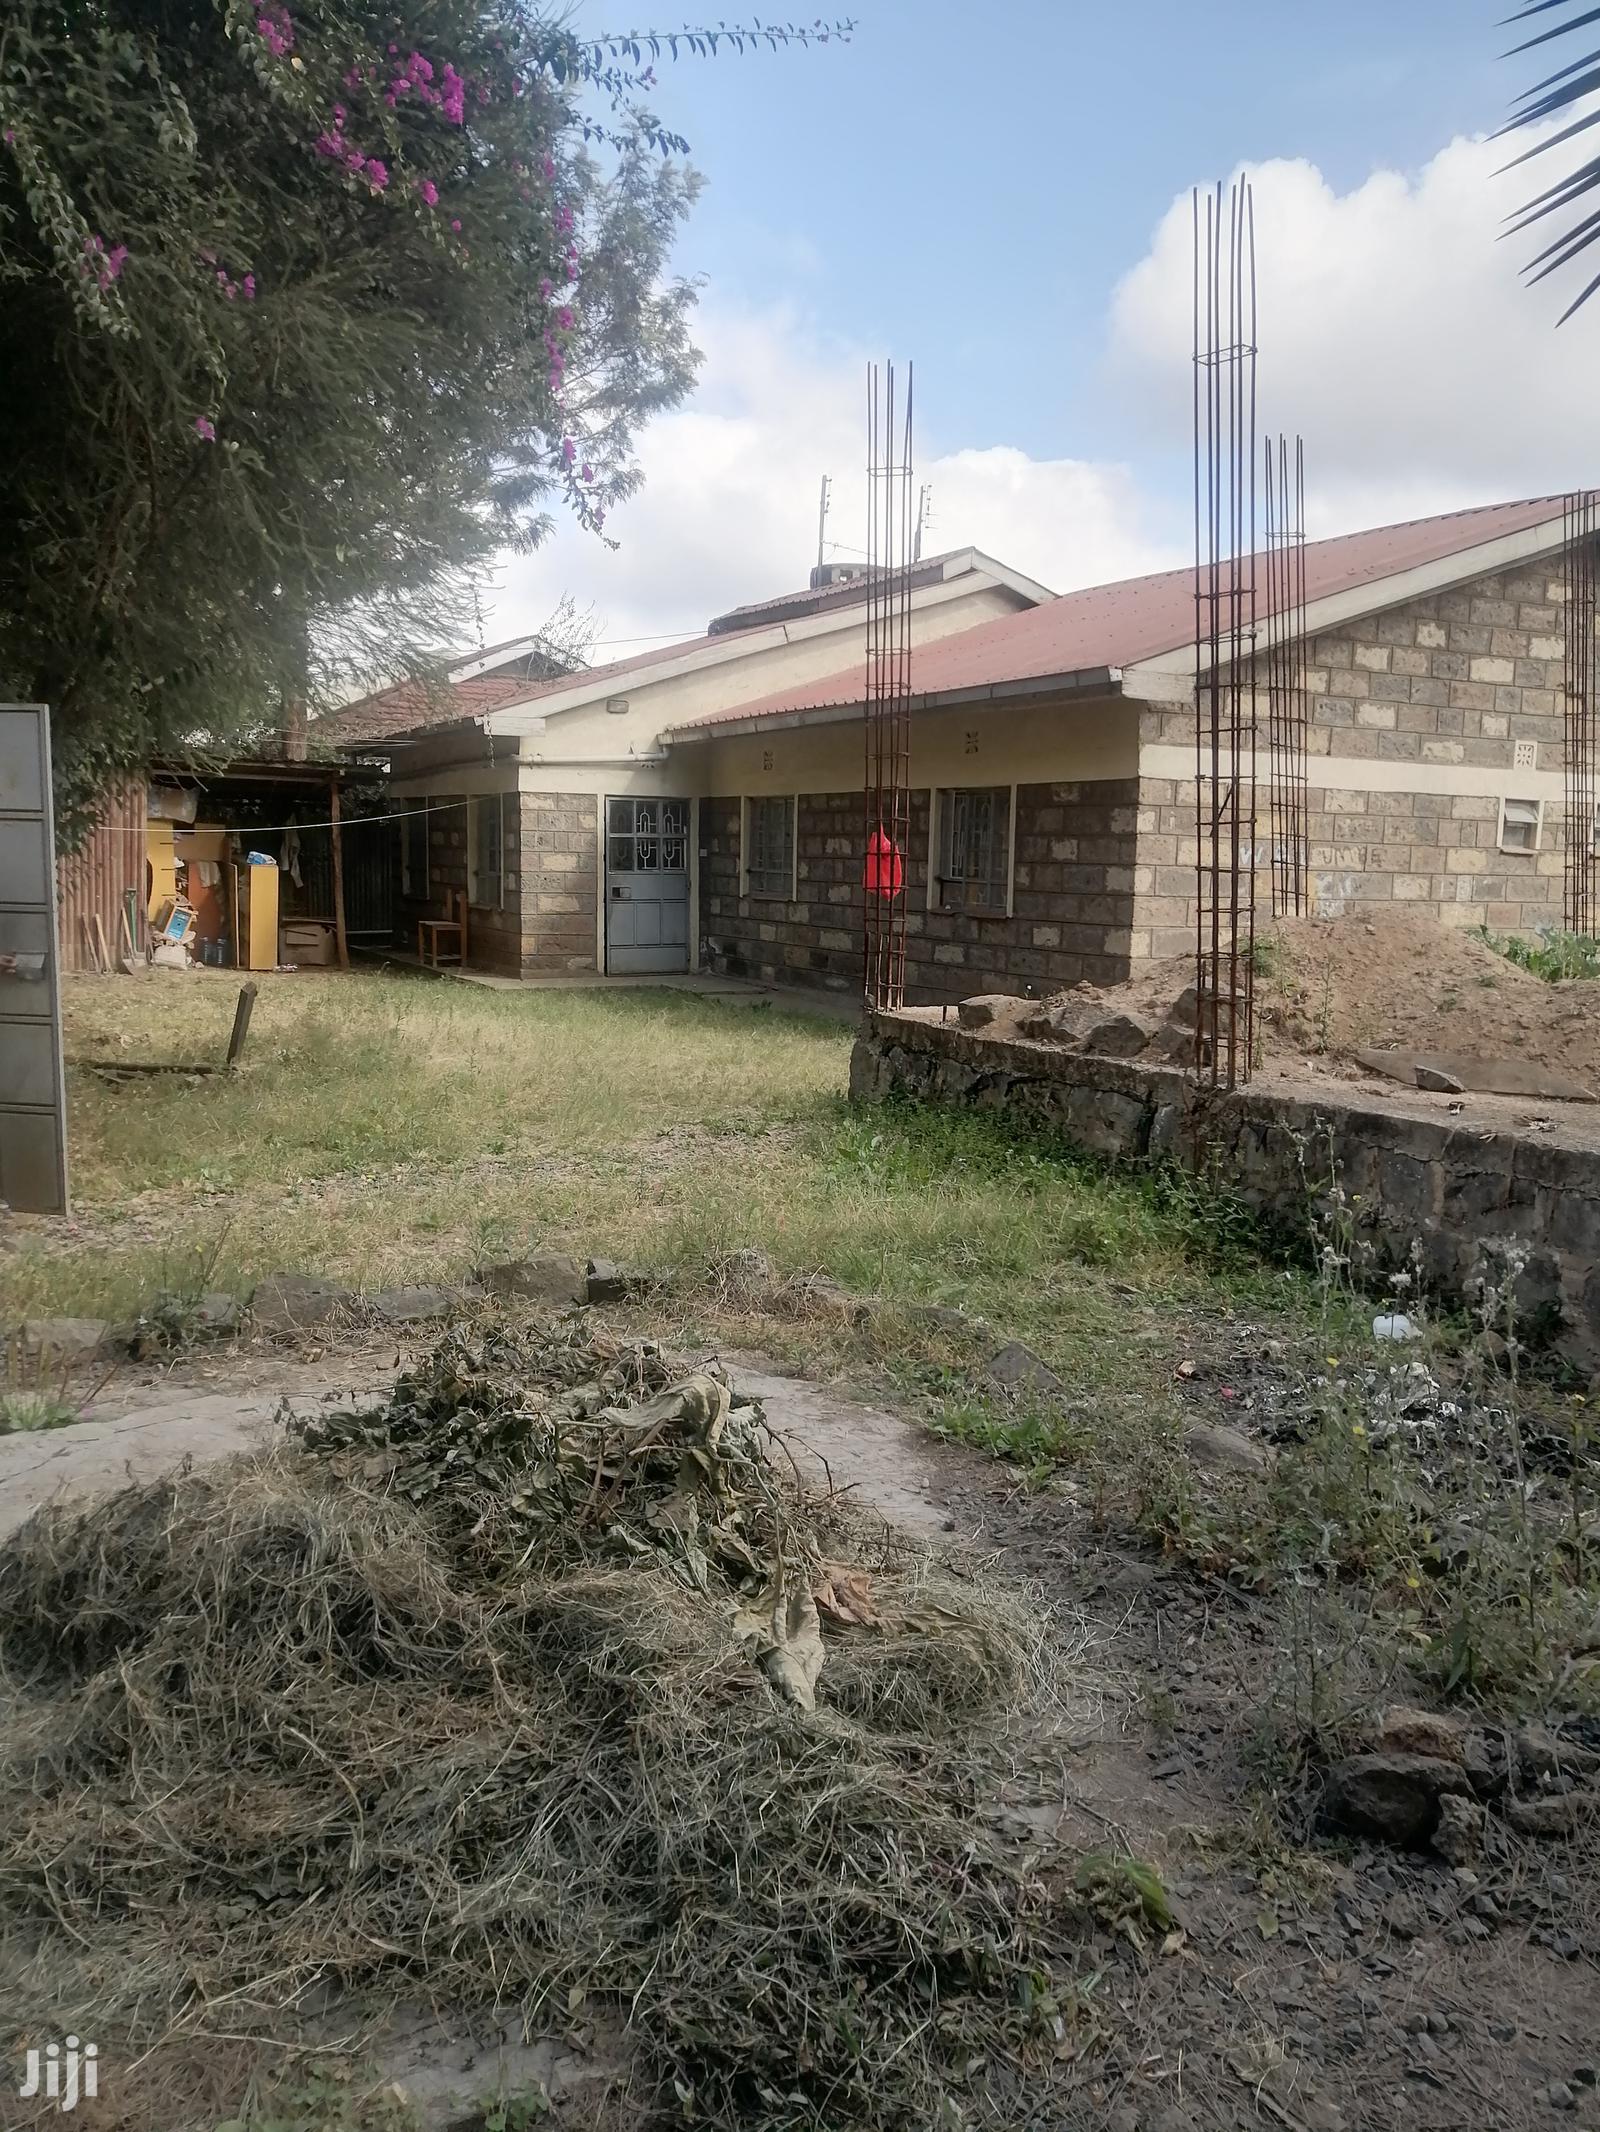 1/8 Acre Plot for Sale   Land & Plots For Sale for sale in Ongata Rongai, Kajiado, Kenya